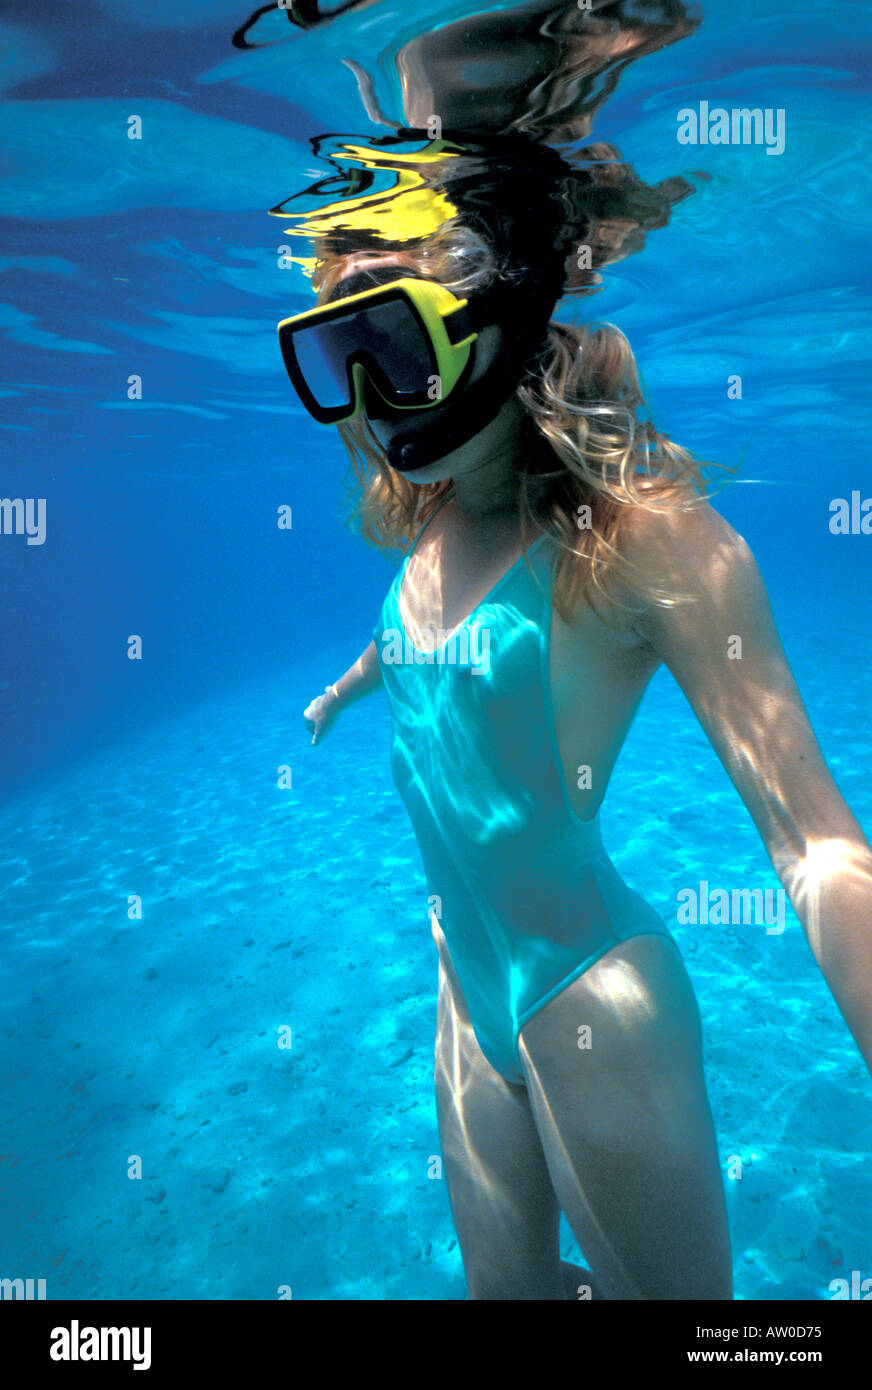 Snorkeling Bahamas Islands Stock Photos & Snorkeling